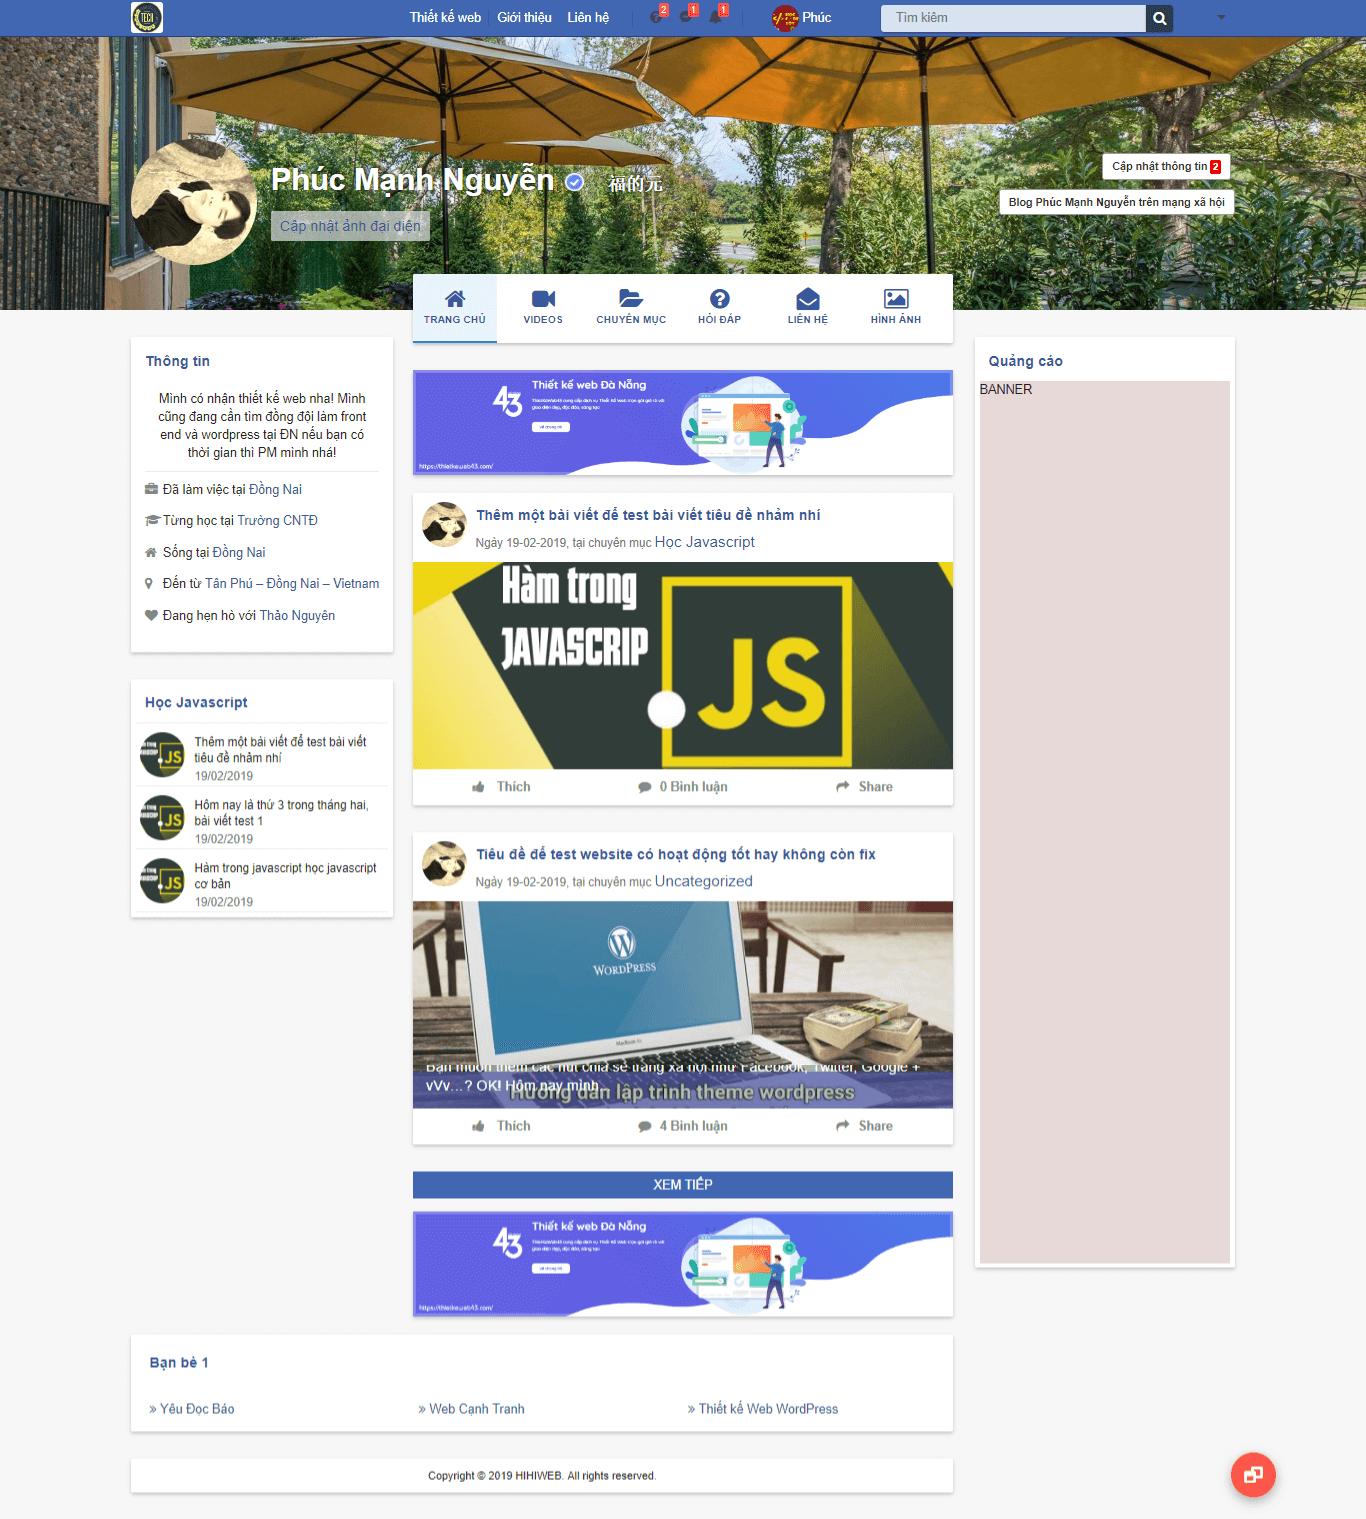 Website blog giống facebook giao diện trang archive